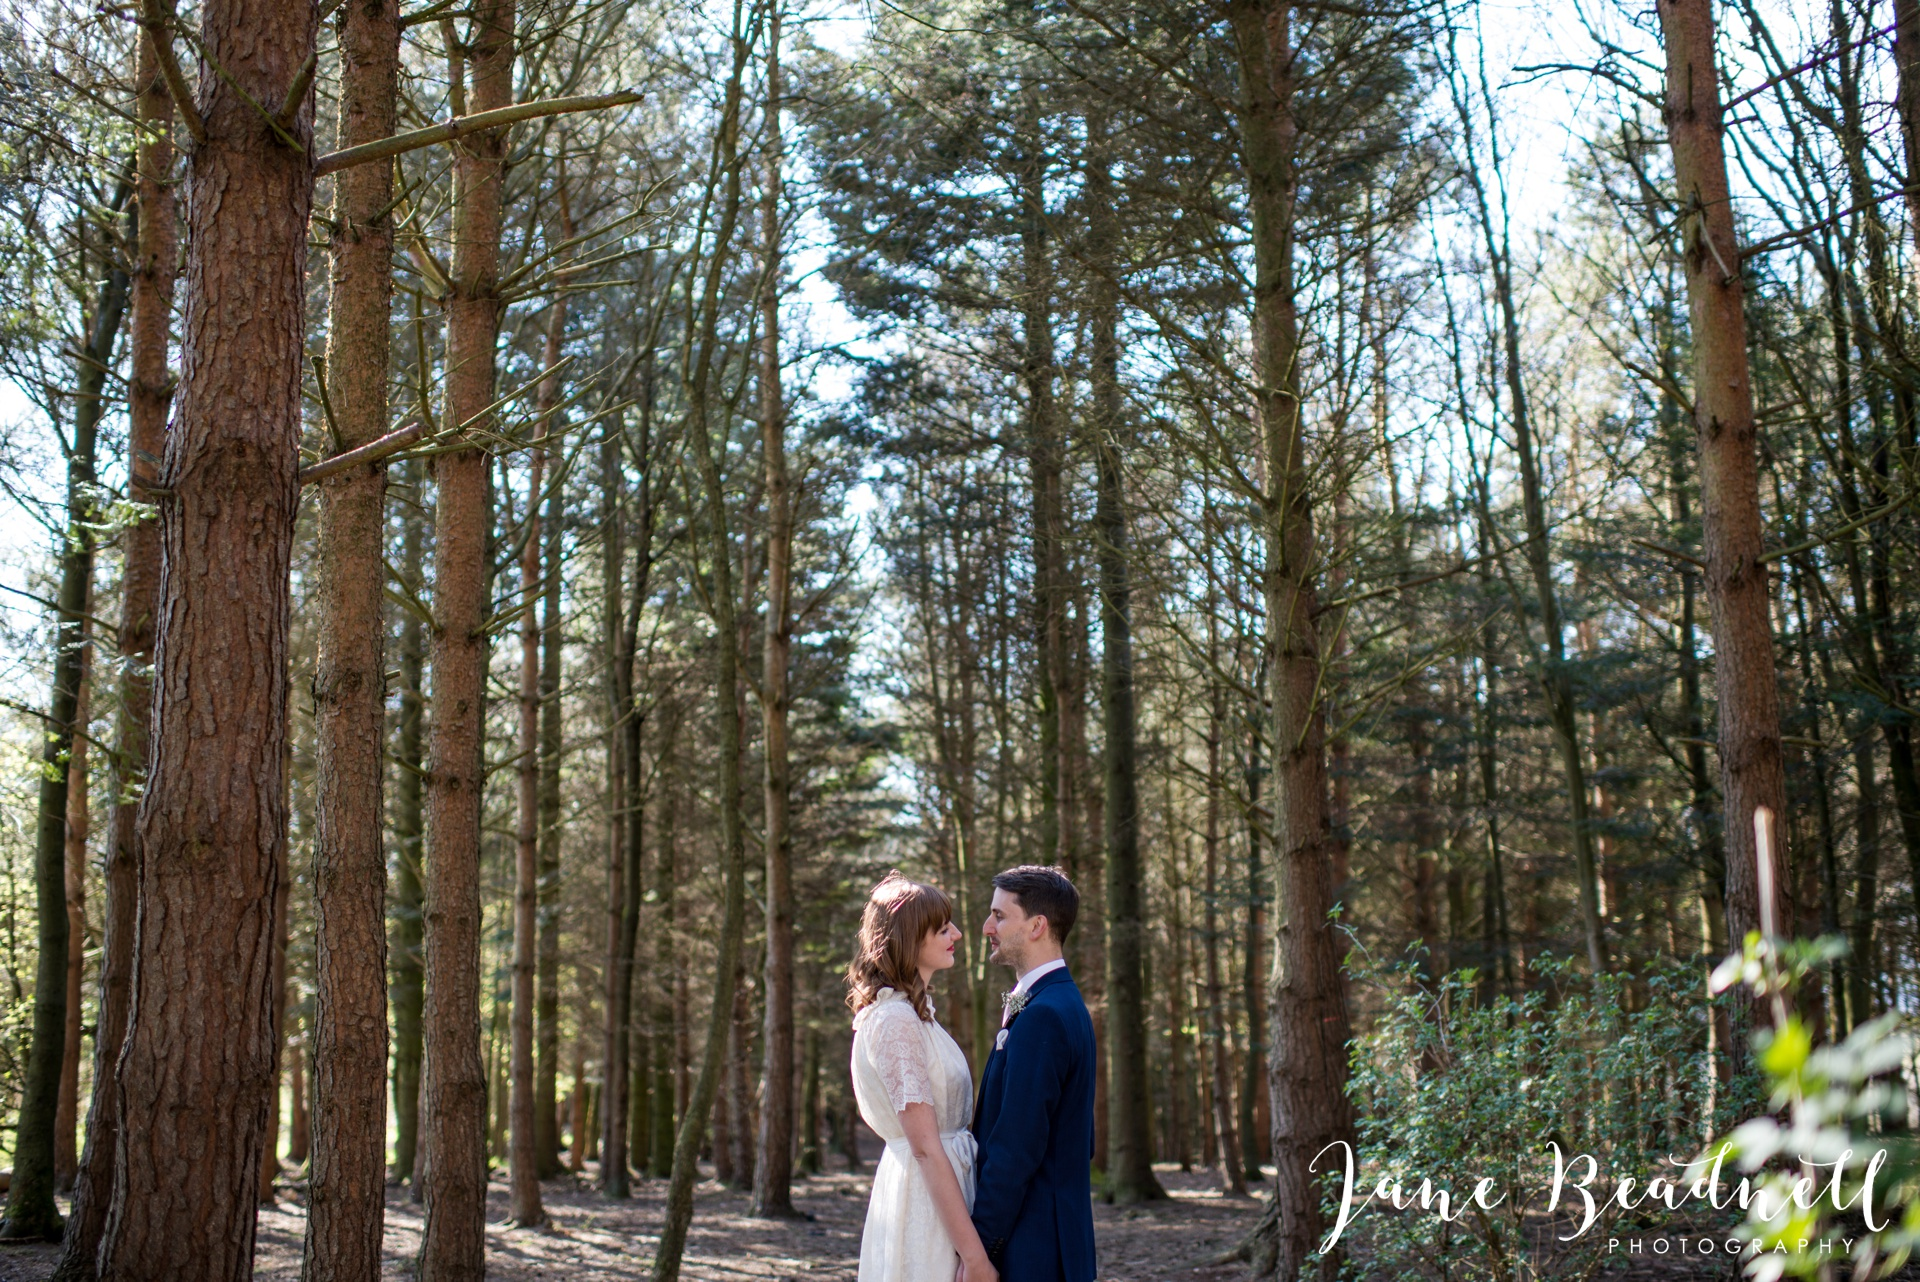 Jane Beadnell fine art wedding photographer The Cheerful Chilli Barn Otley_0035